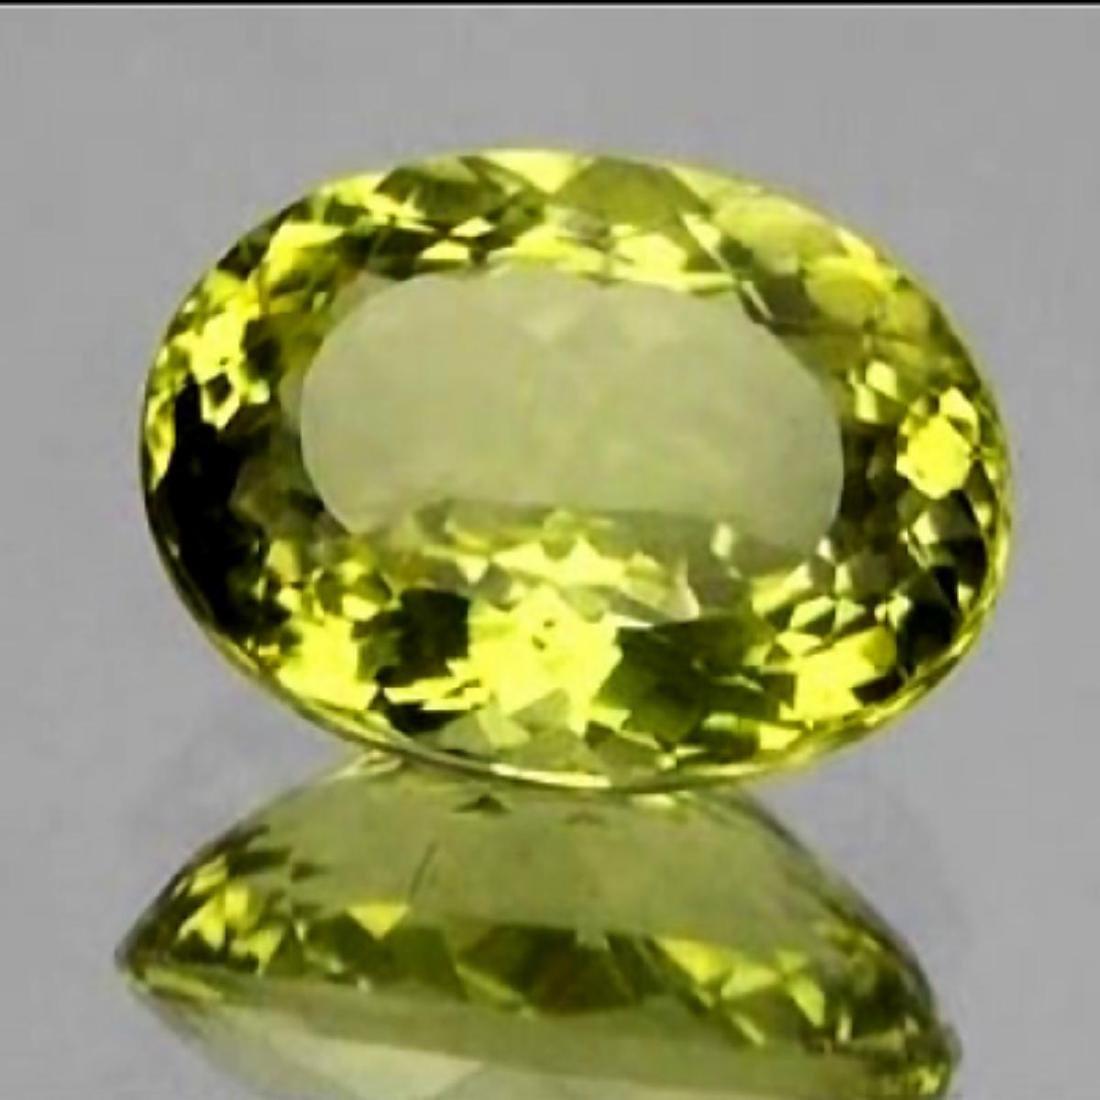 Natural Lemon Quartz 7.18 Cts - VVS